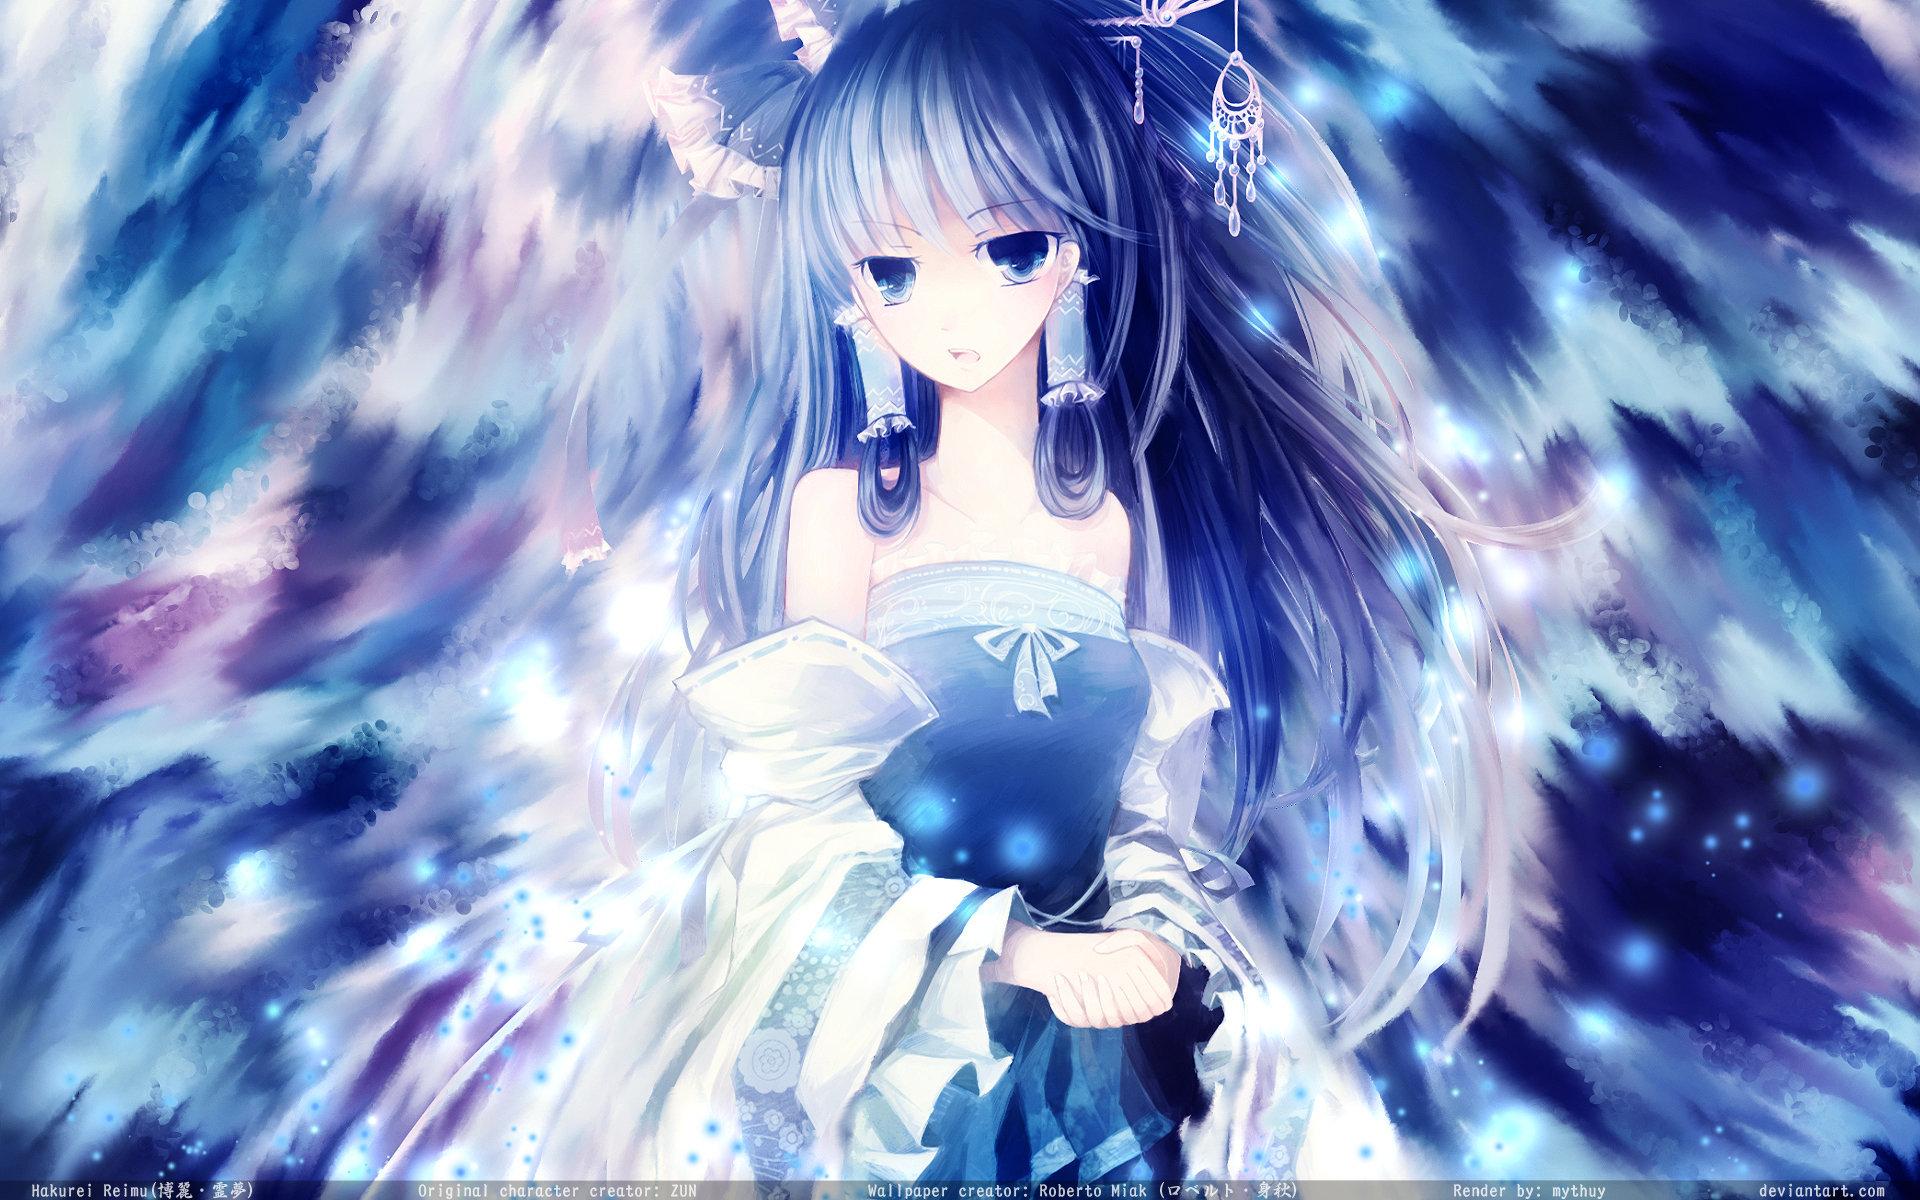 Reimu Hakurei - The Blue Maiden by Roberto-Miak